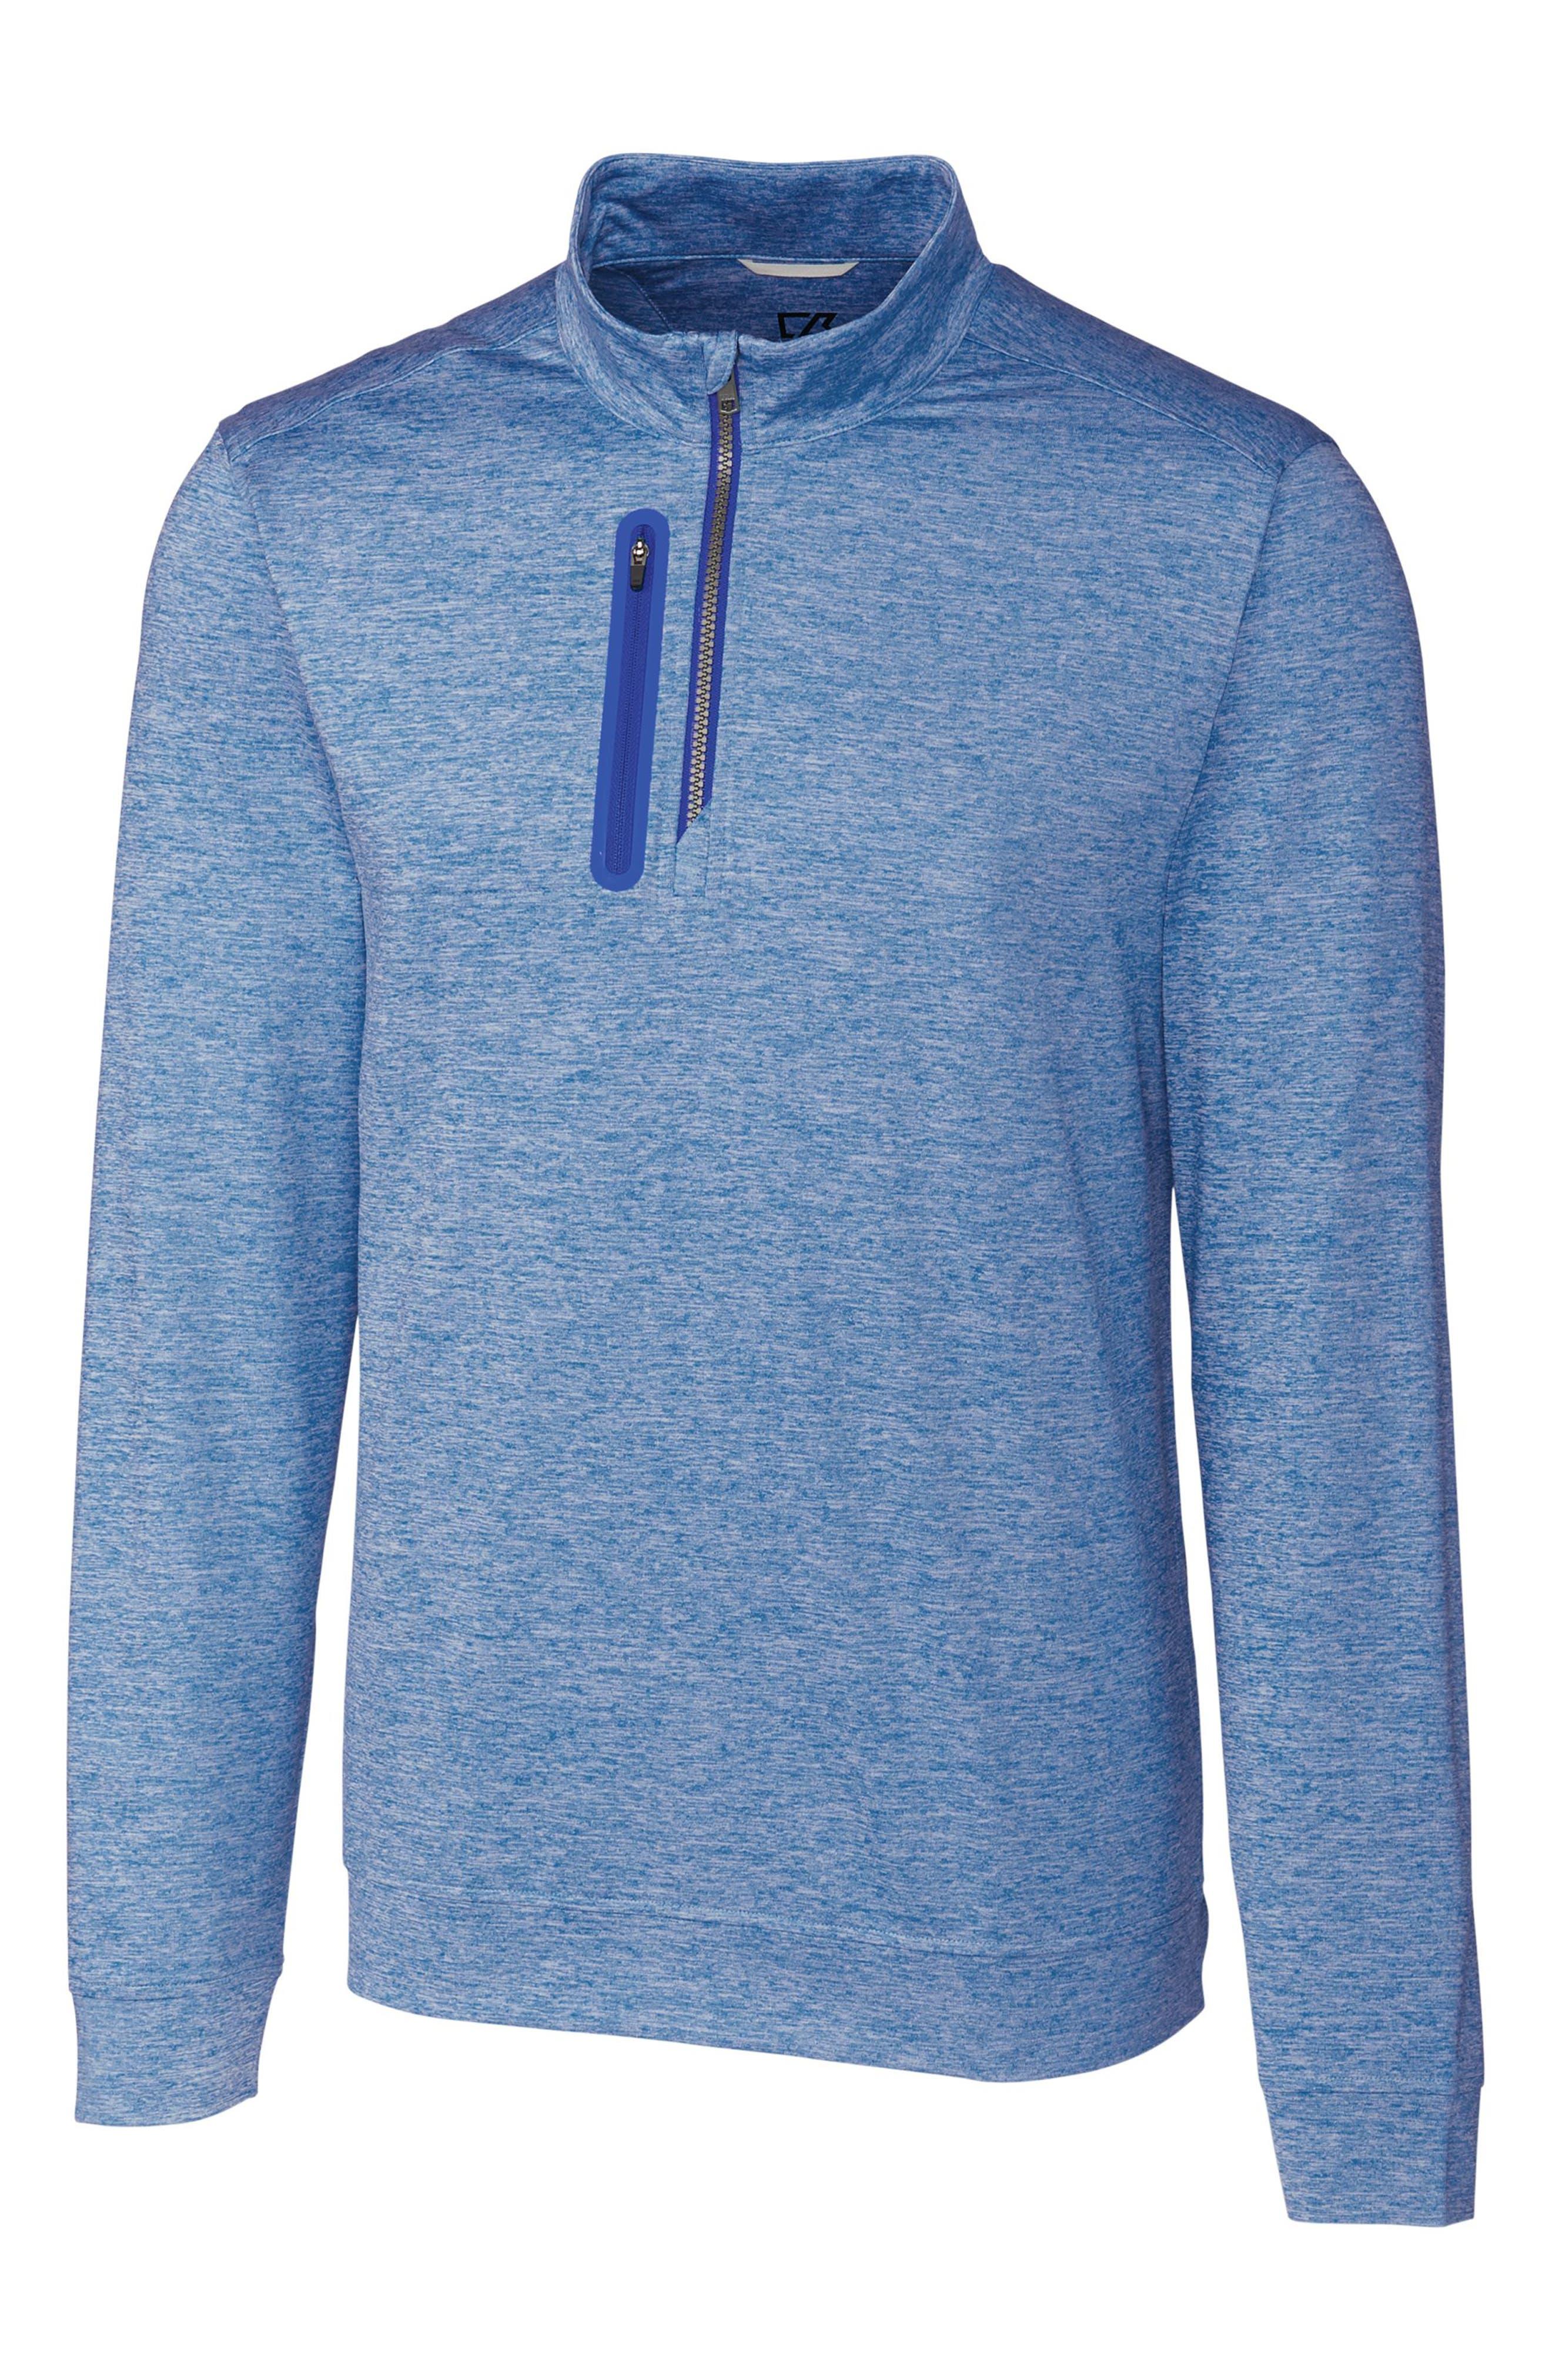 Stealth Regular Fit Half Zip Pullover